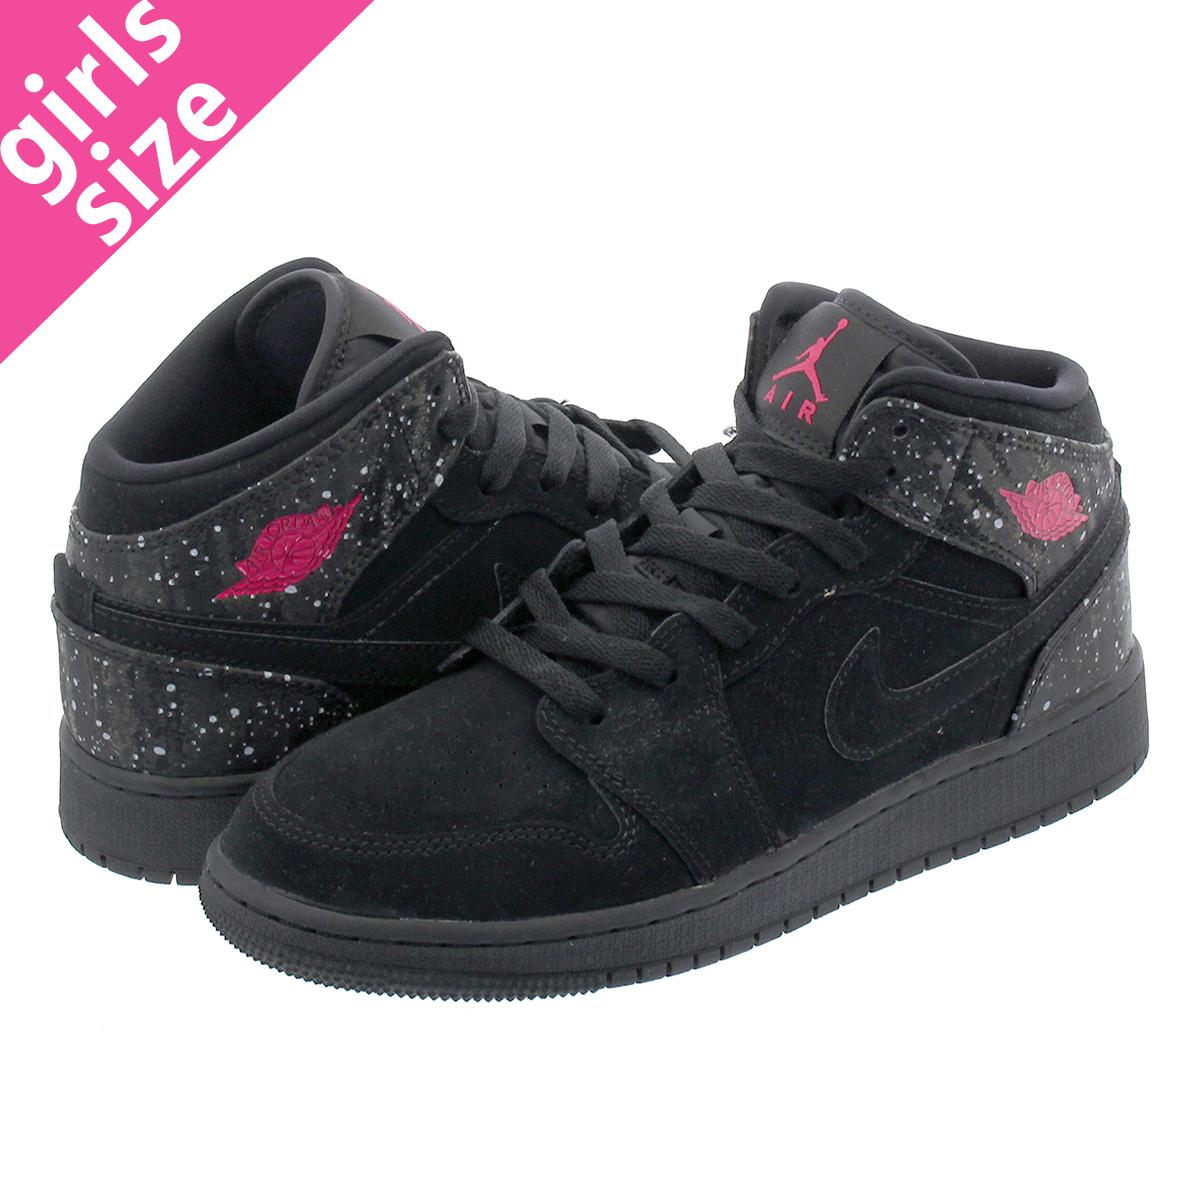 555 1 Mid Blackwhiterush 112 Nike Air 001 Jordan Pink Gg OPkXuiZ